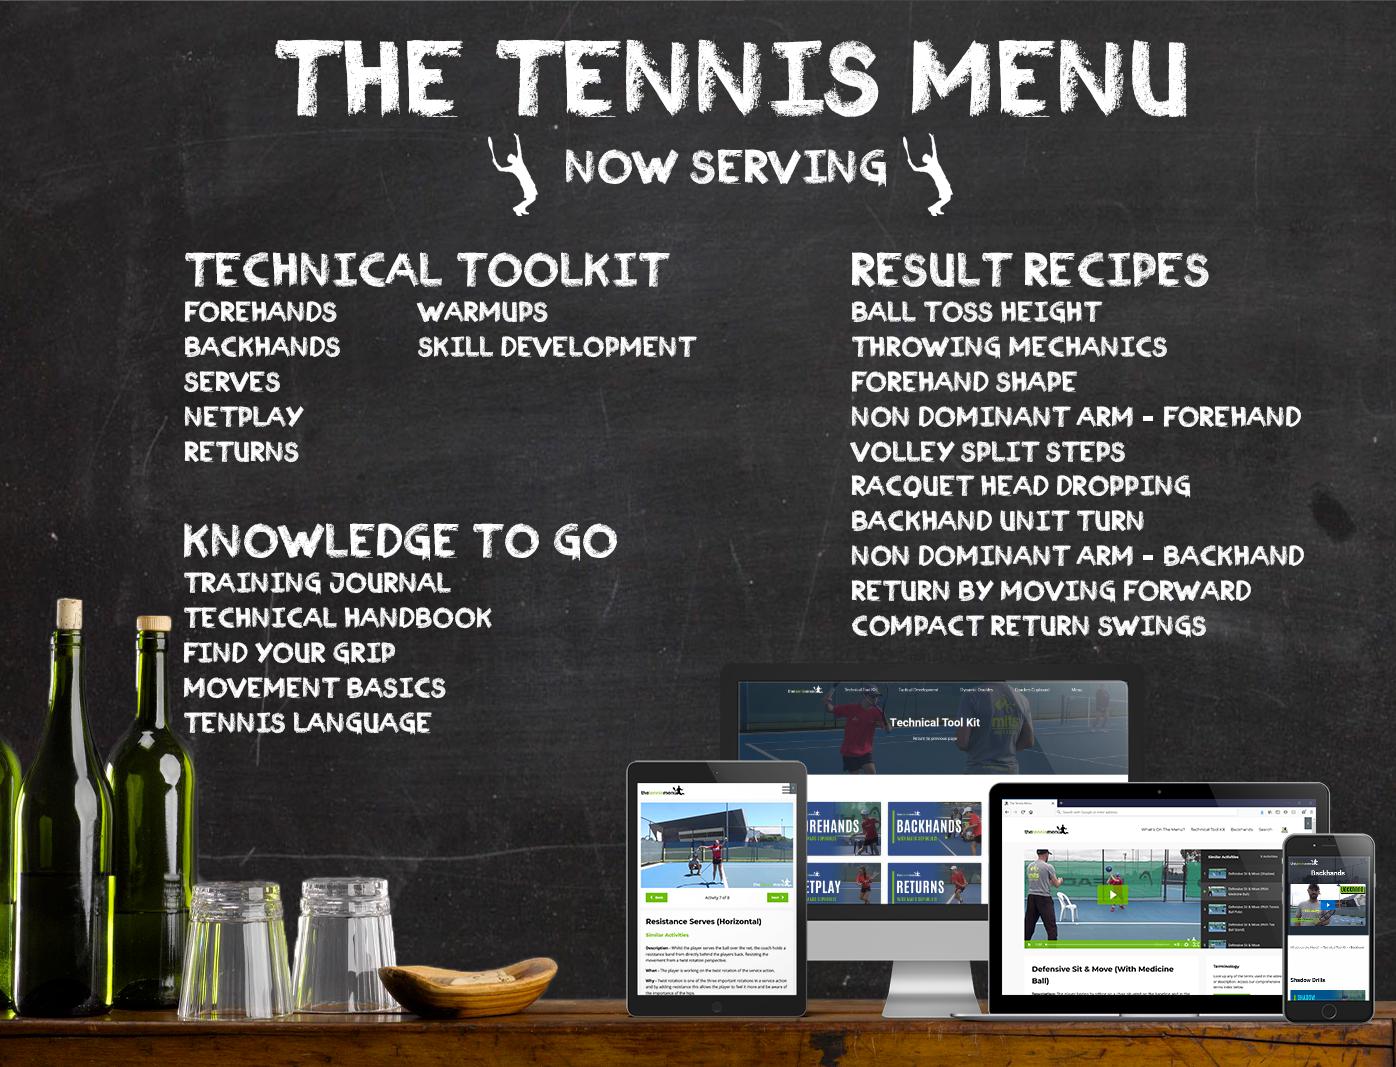 Now Serving - The Tennis Menu